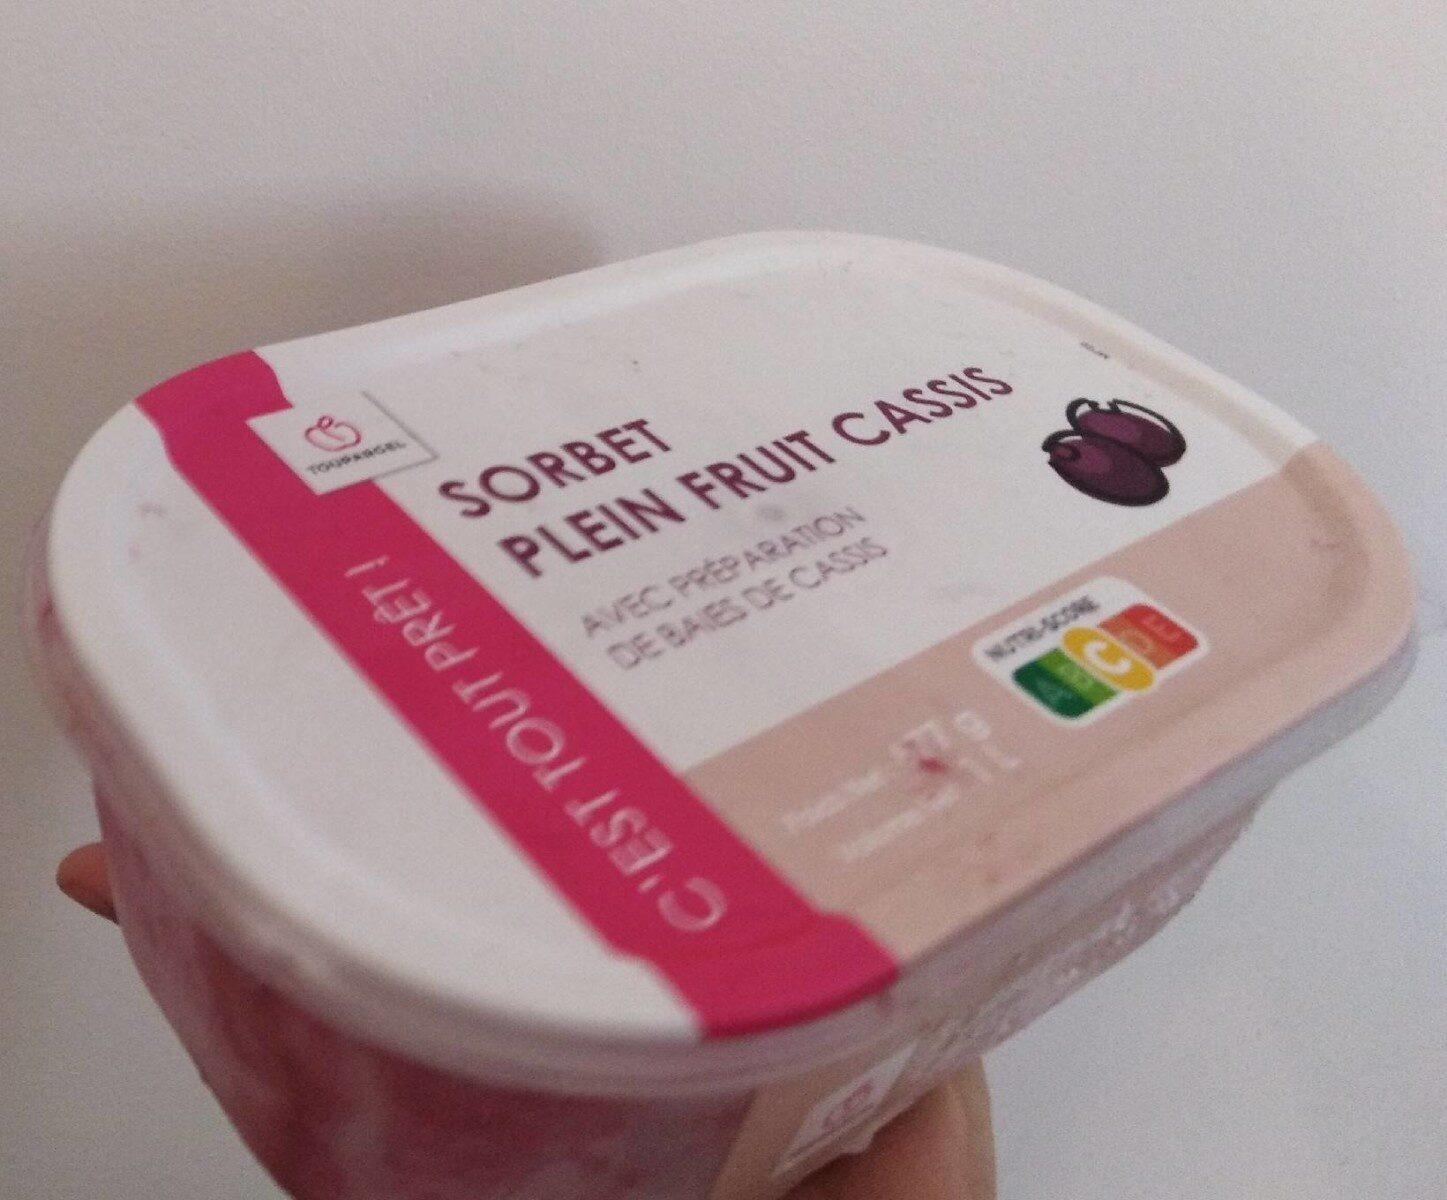 Sorbet plein fruit cassis - Product - fr